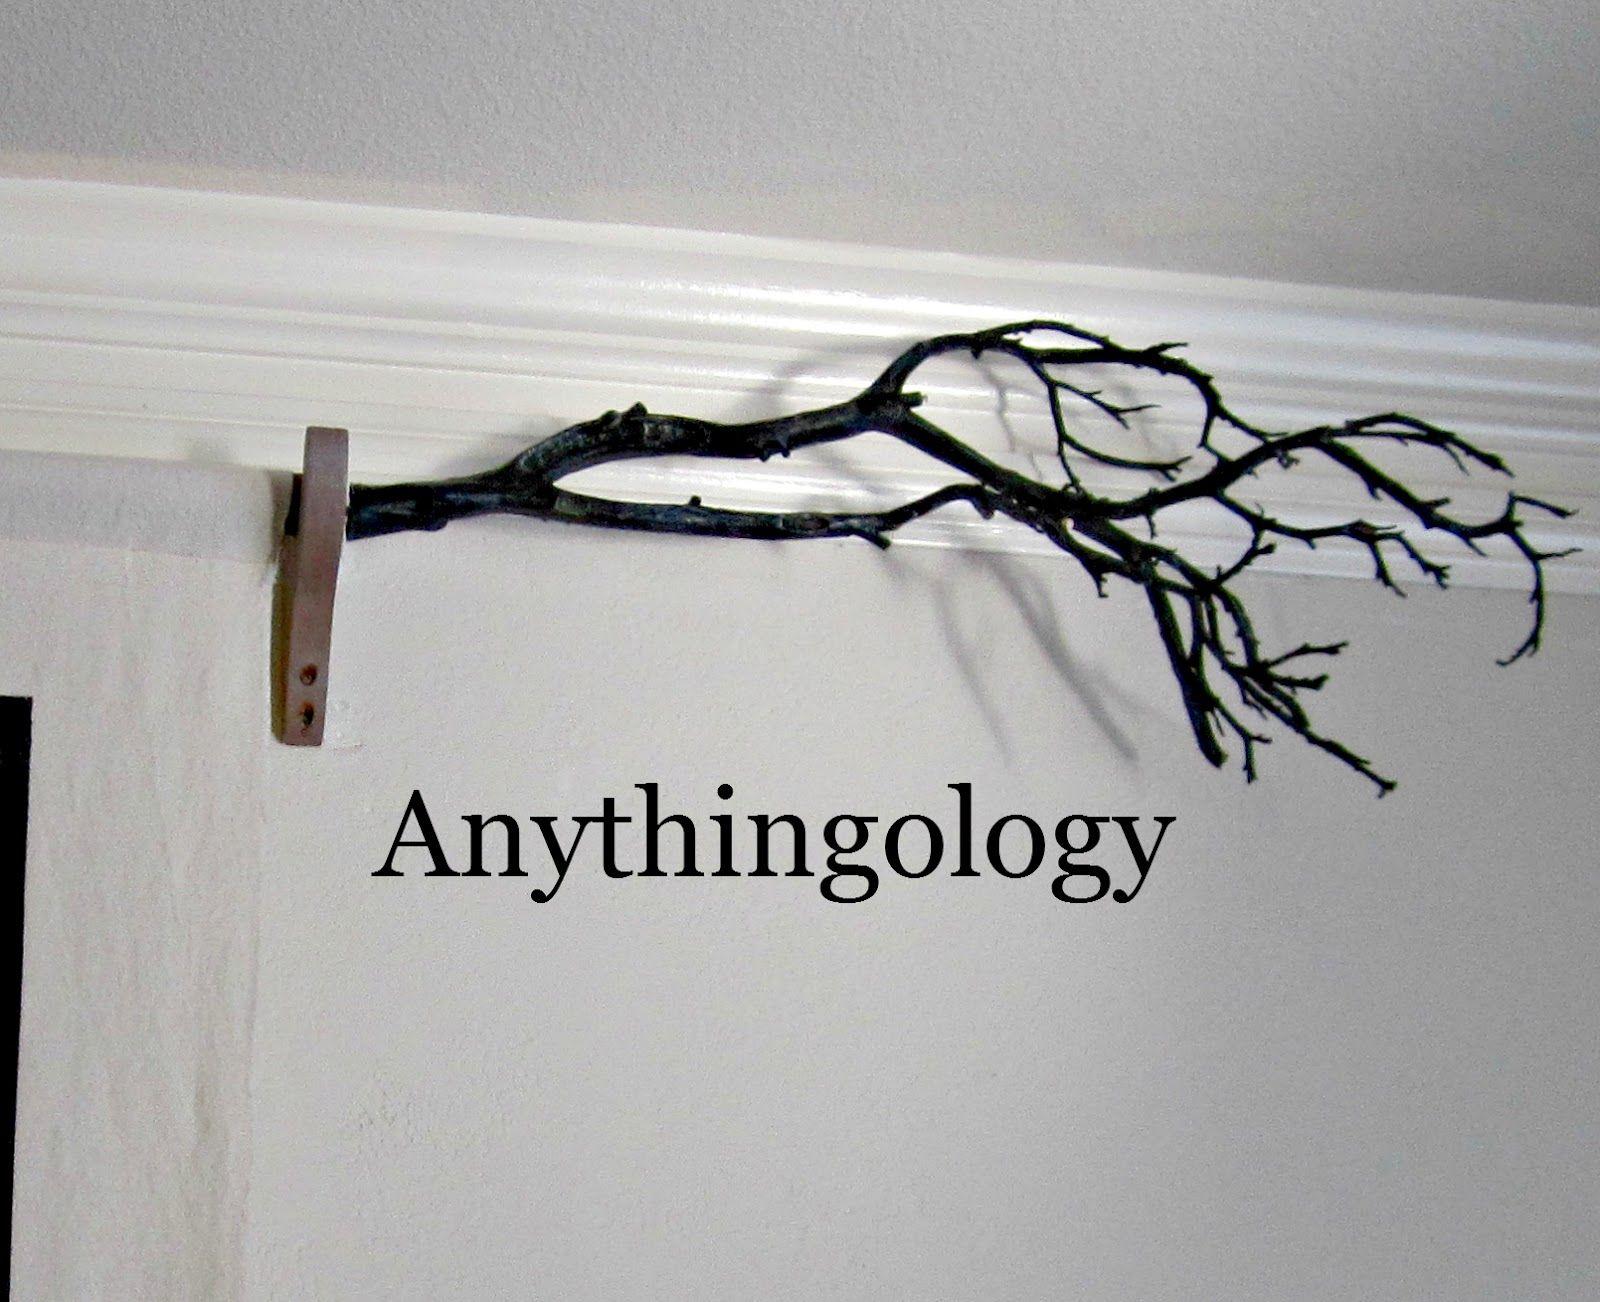 tree branch as curtain rod finials